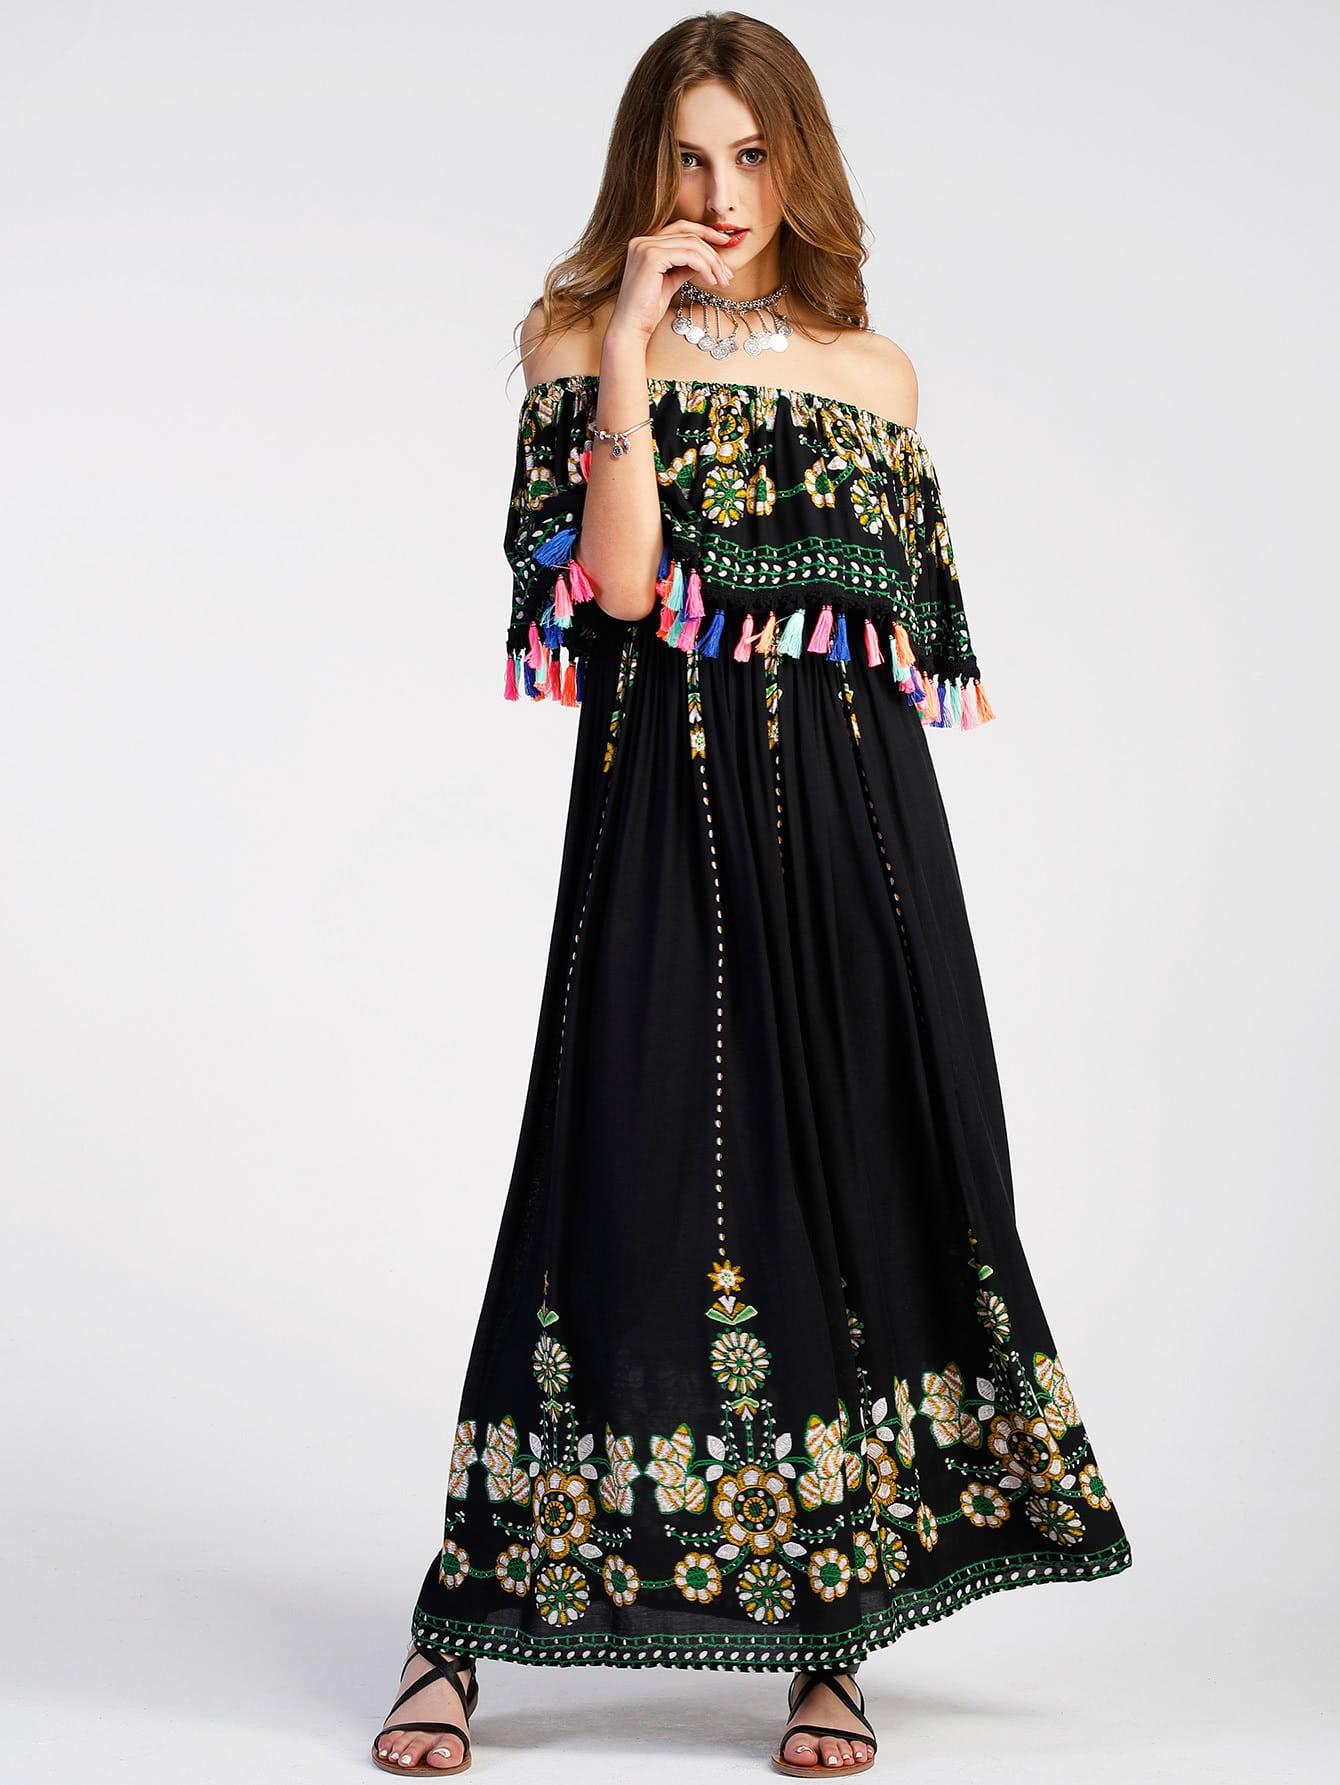 Flounce Layered Neckline Tassel Trim Aztec Print Dress dress170606110